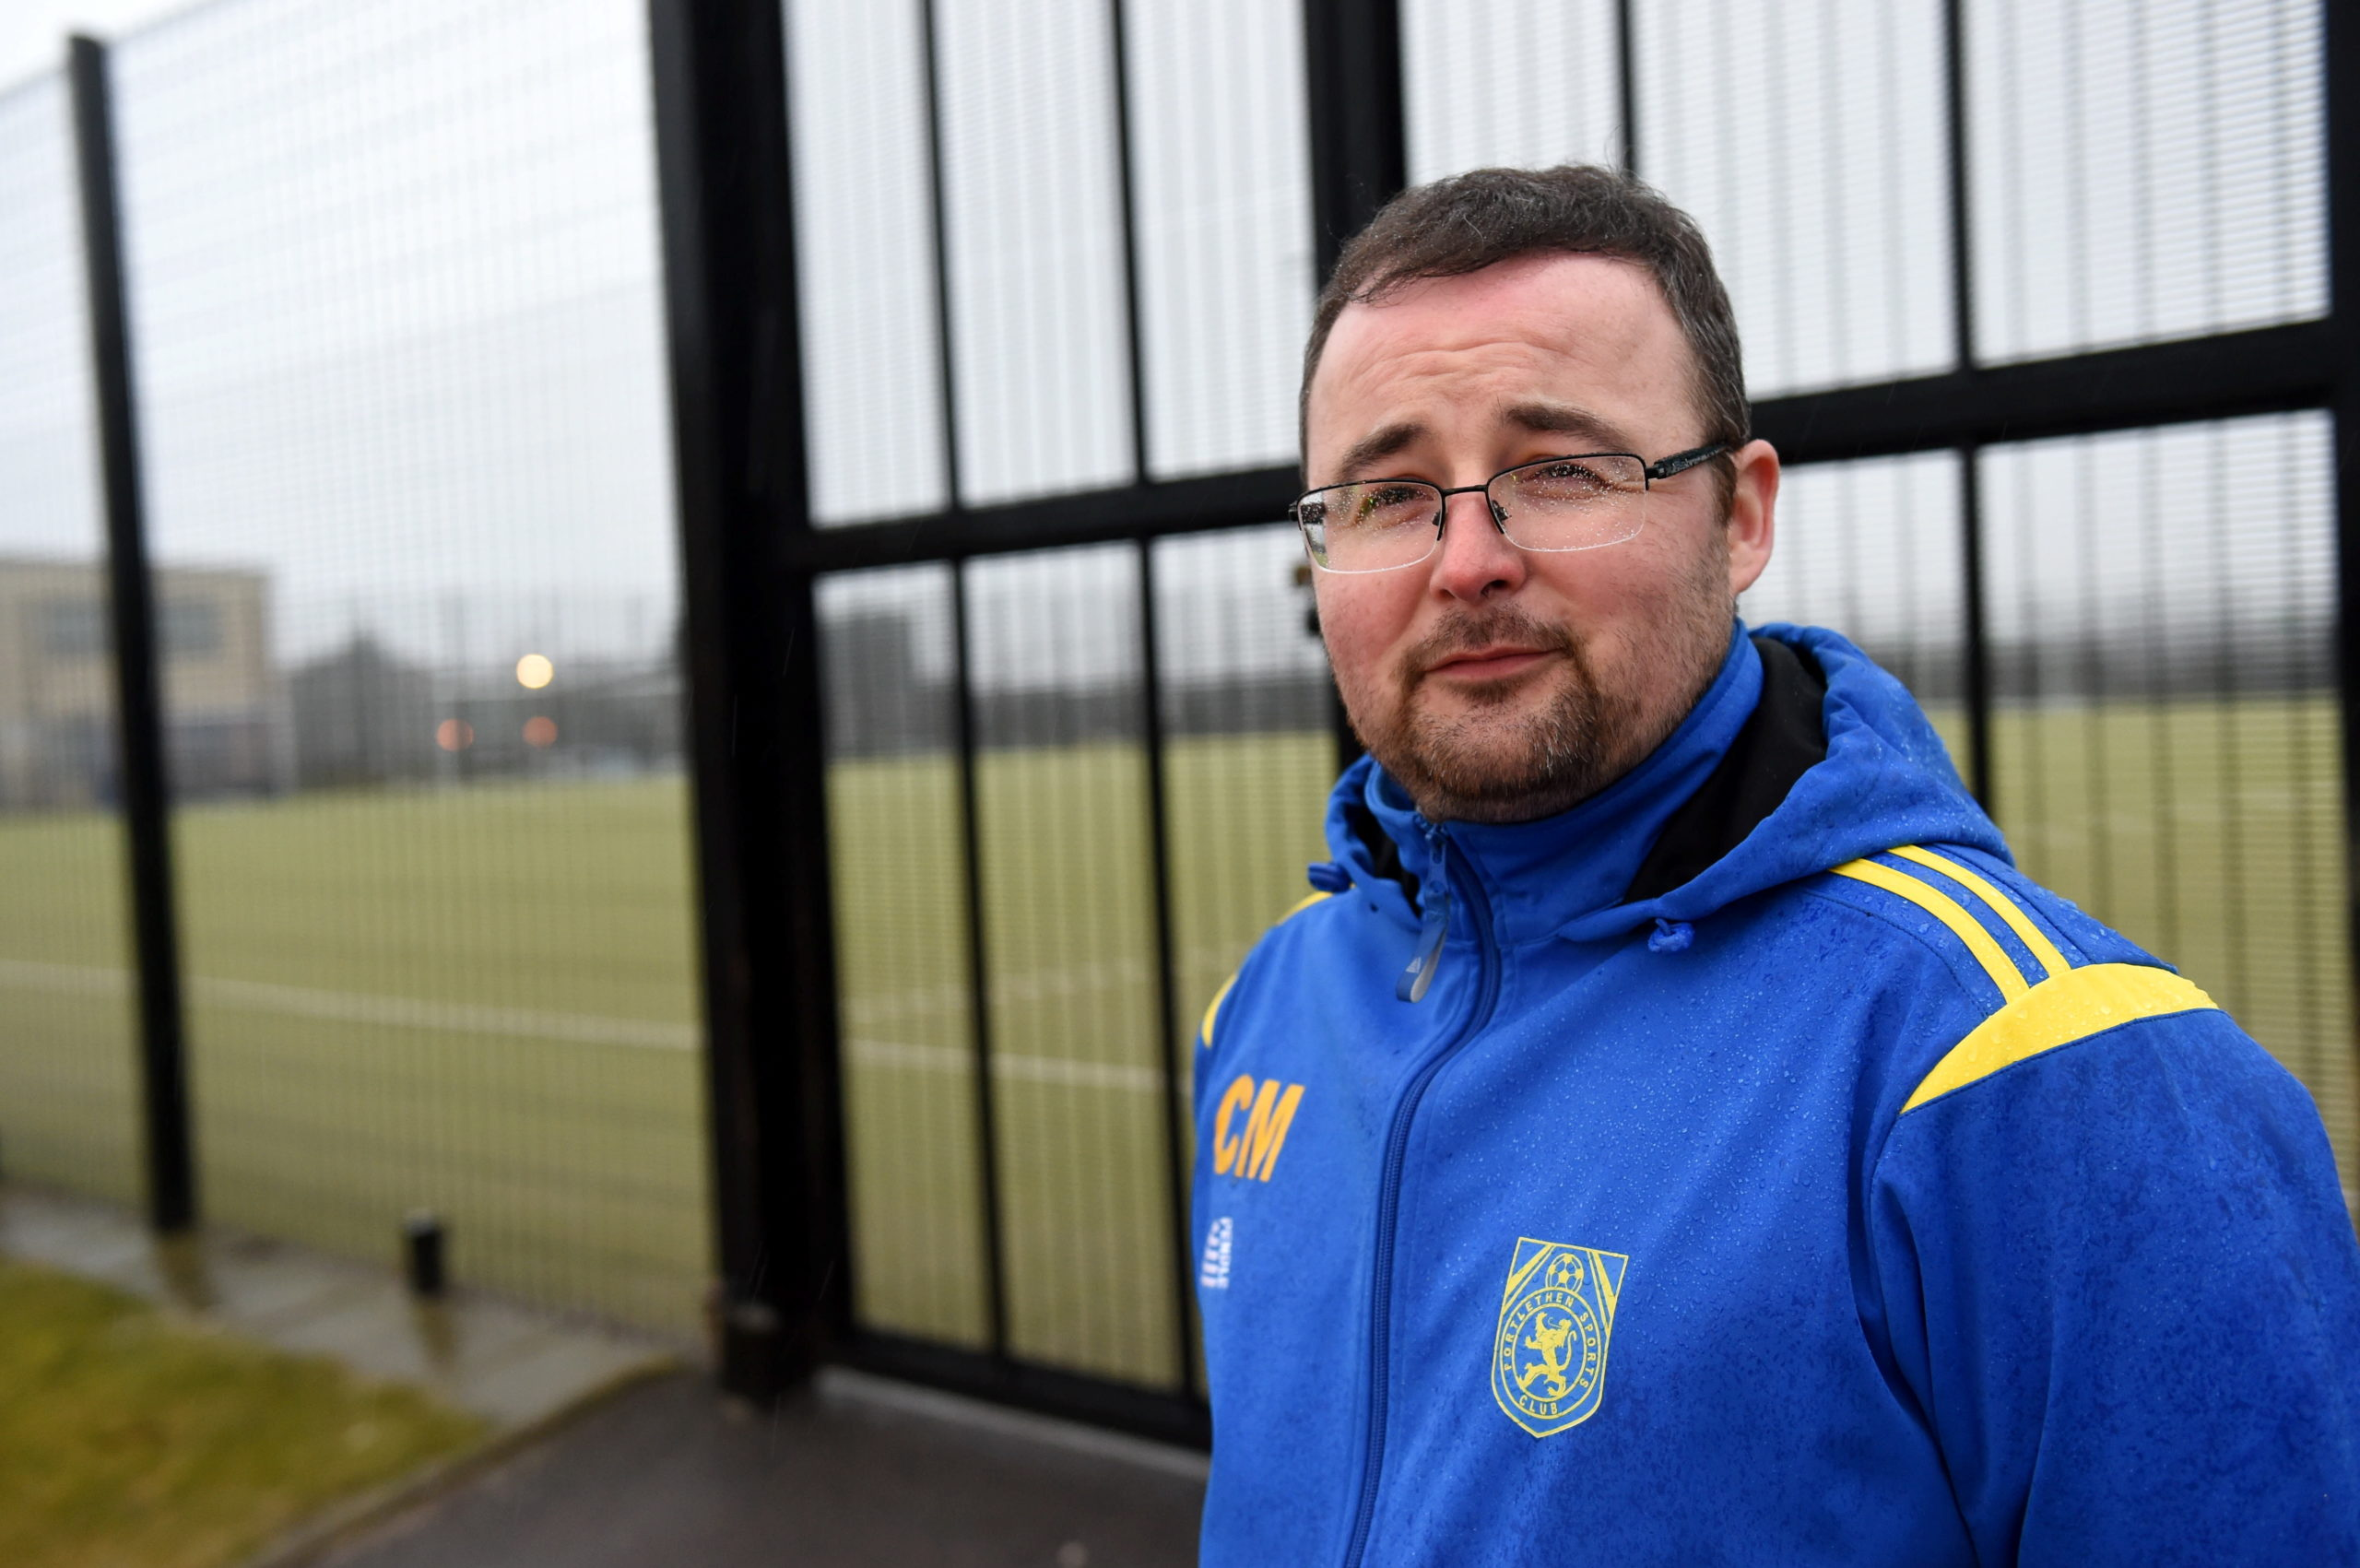 Craig McMorrin, chairman of Portlethen Sports Club.